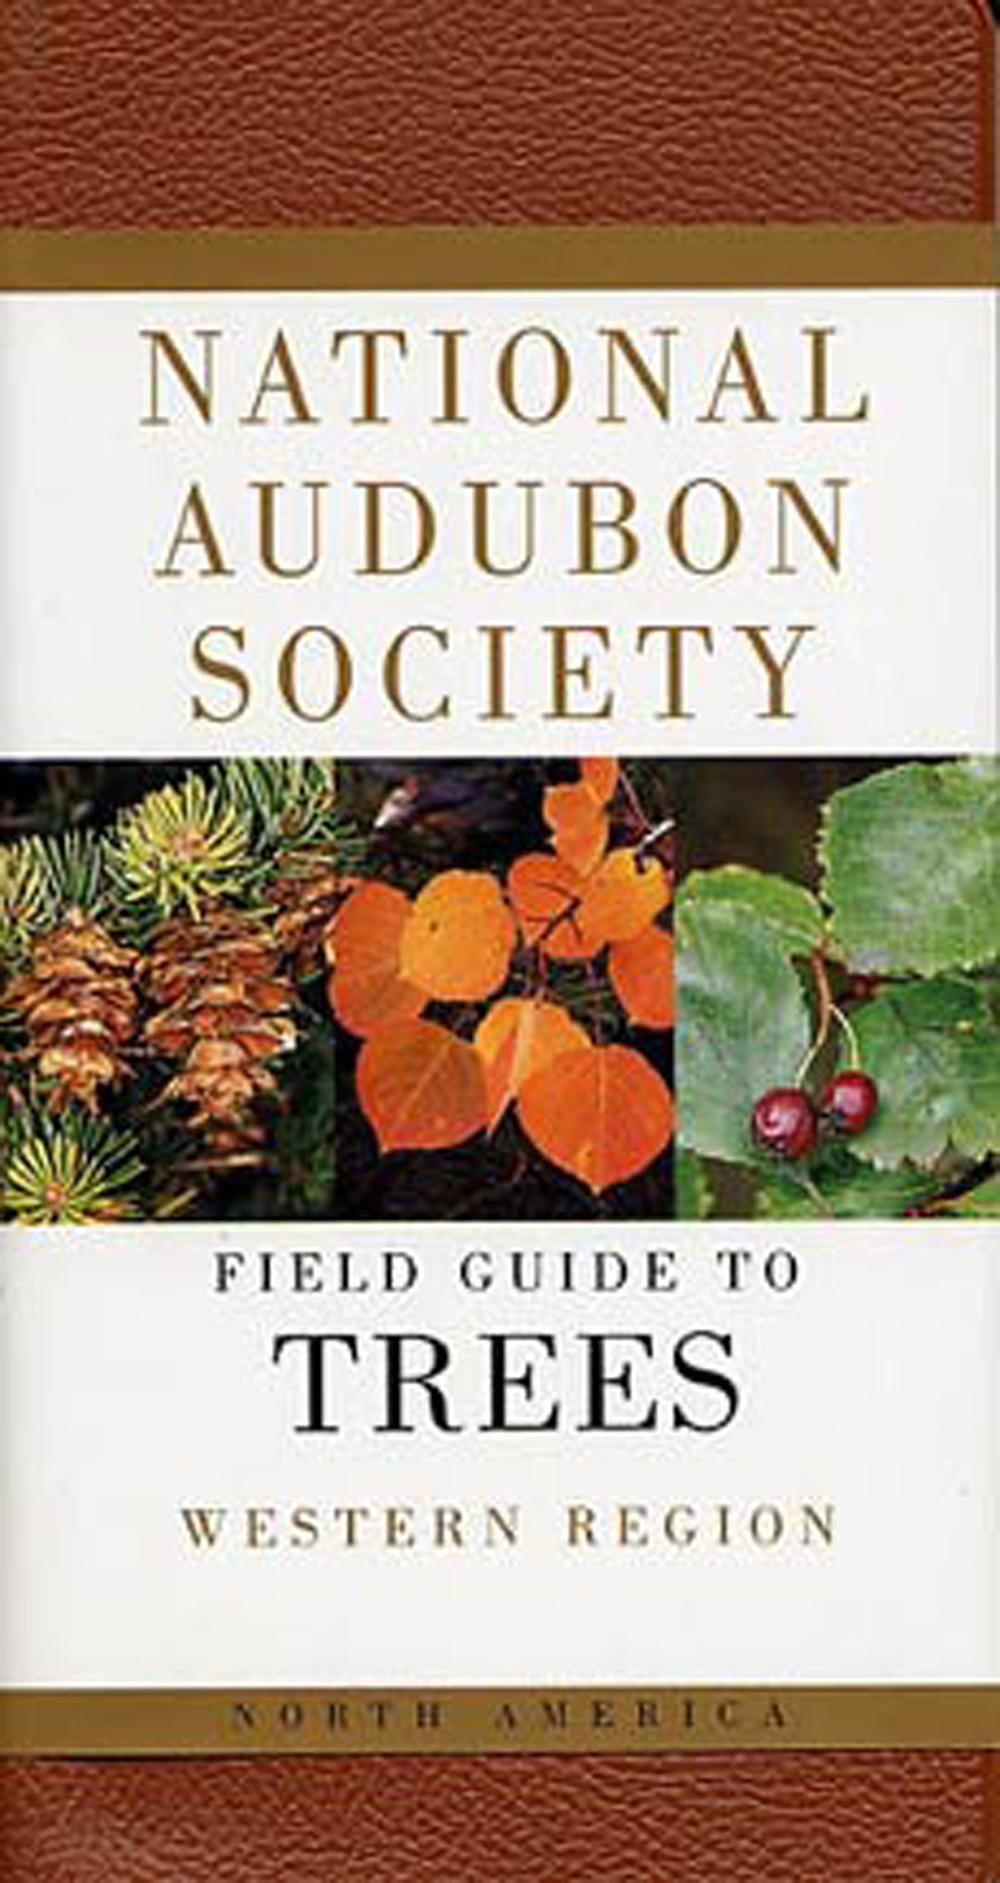 Field Guide to Trees, Western Region (National Audubon Society®)